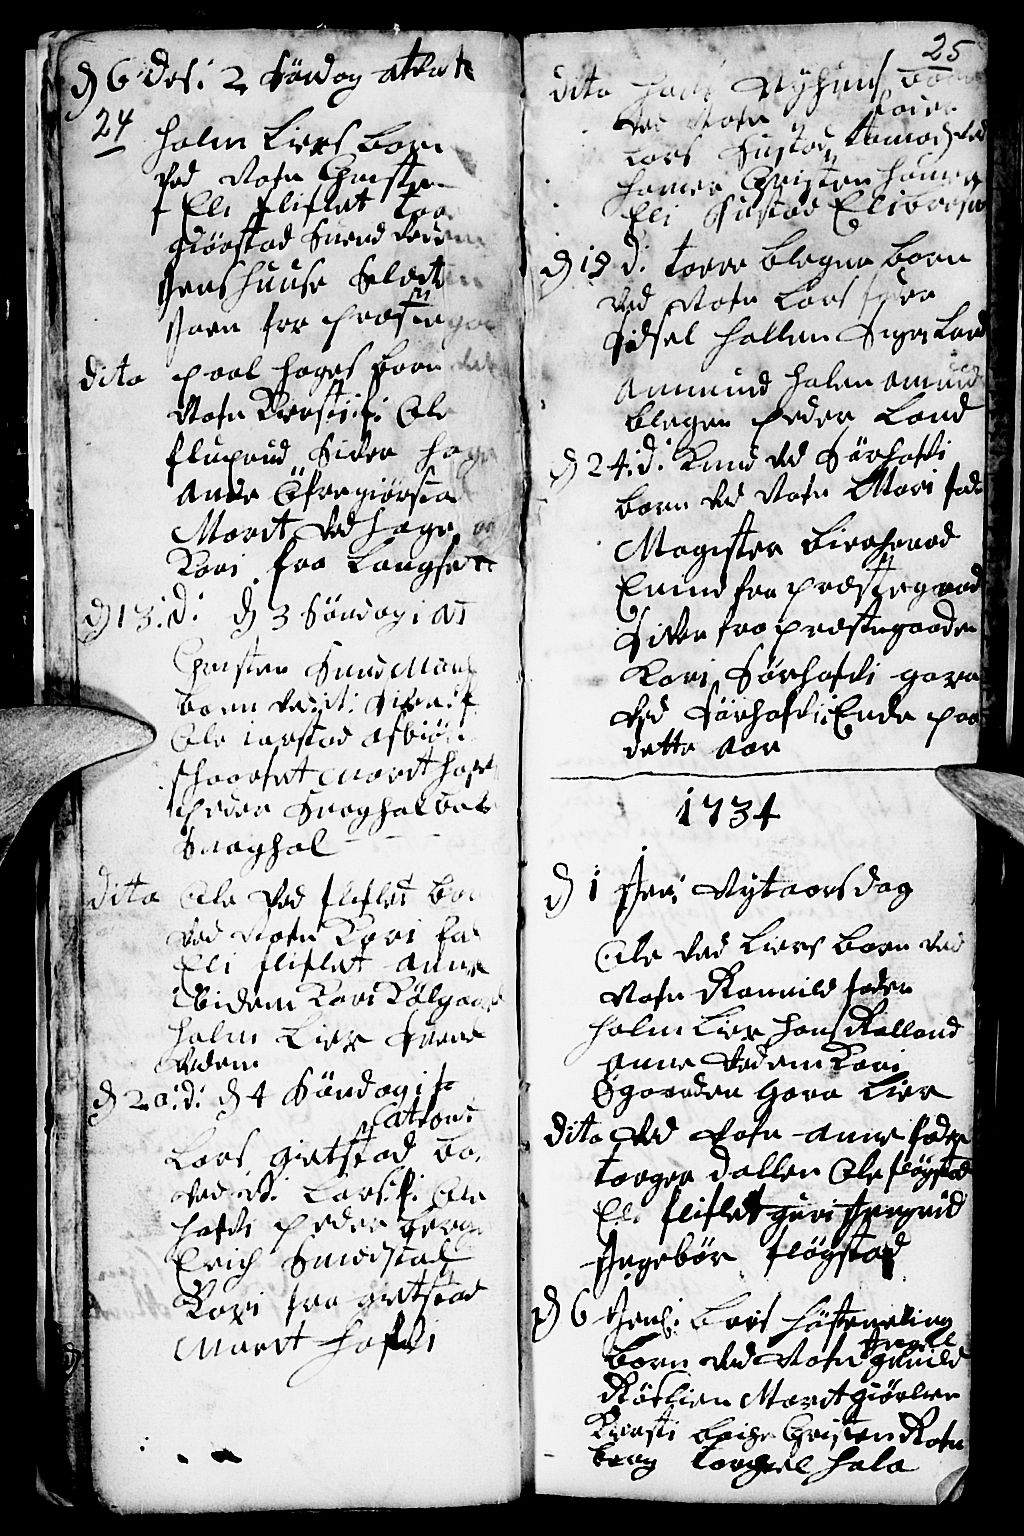 SAH, Fåberg prestekontor, Ministerialbok nr. 1, 1727-1775, s. 24-25